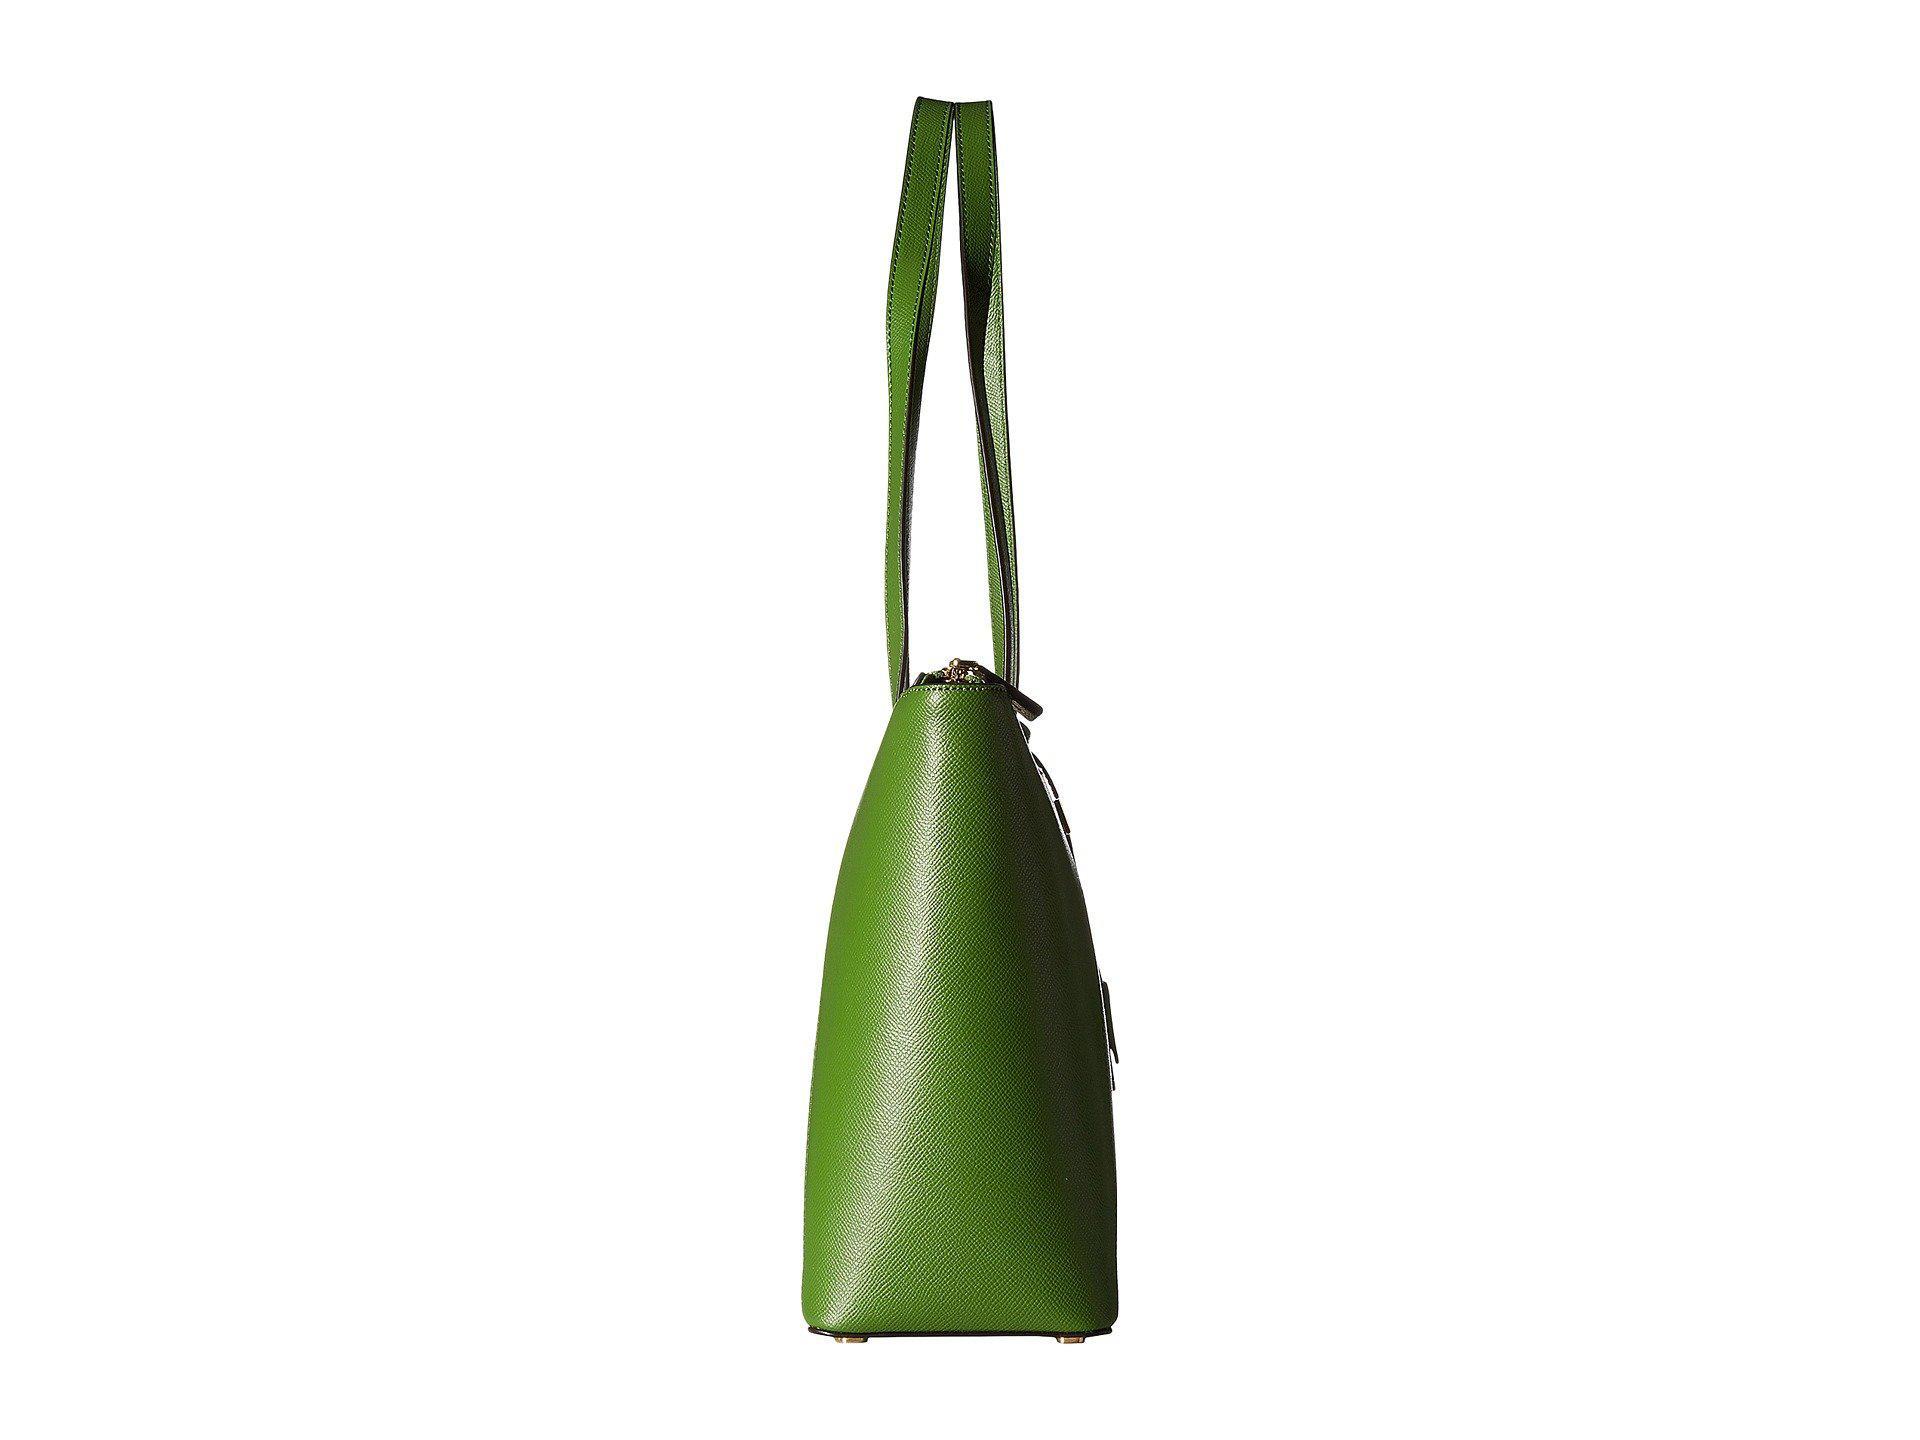 Lyst Michael Kors Maddie Medium E W Top Zip Tote In Green Jet Set Travel Antique Rose Bag Tas Wanita Pink Gallery